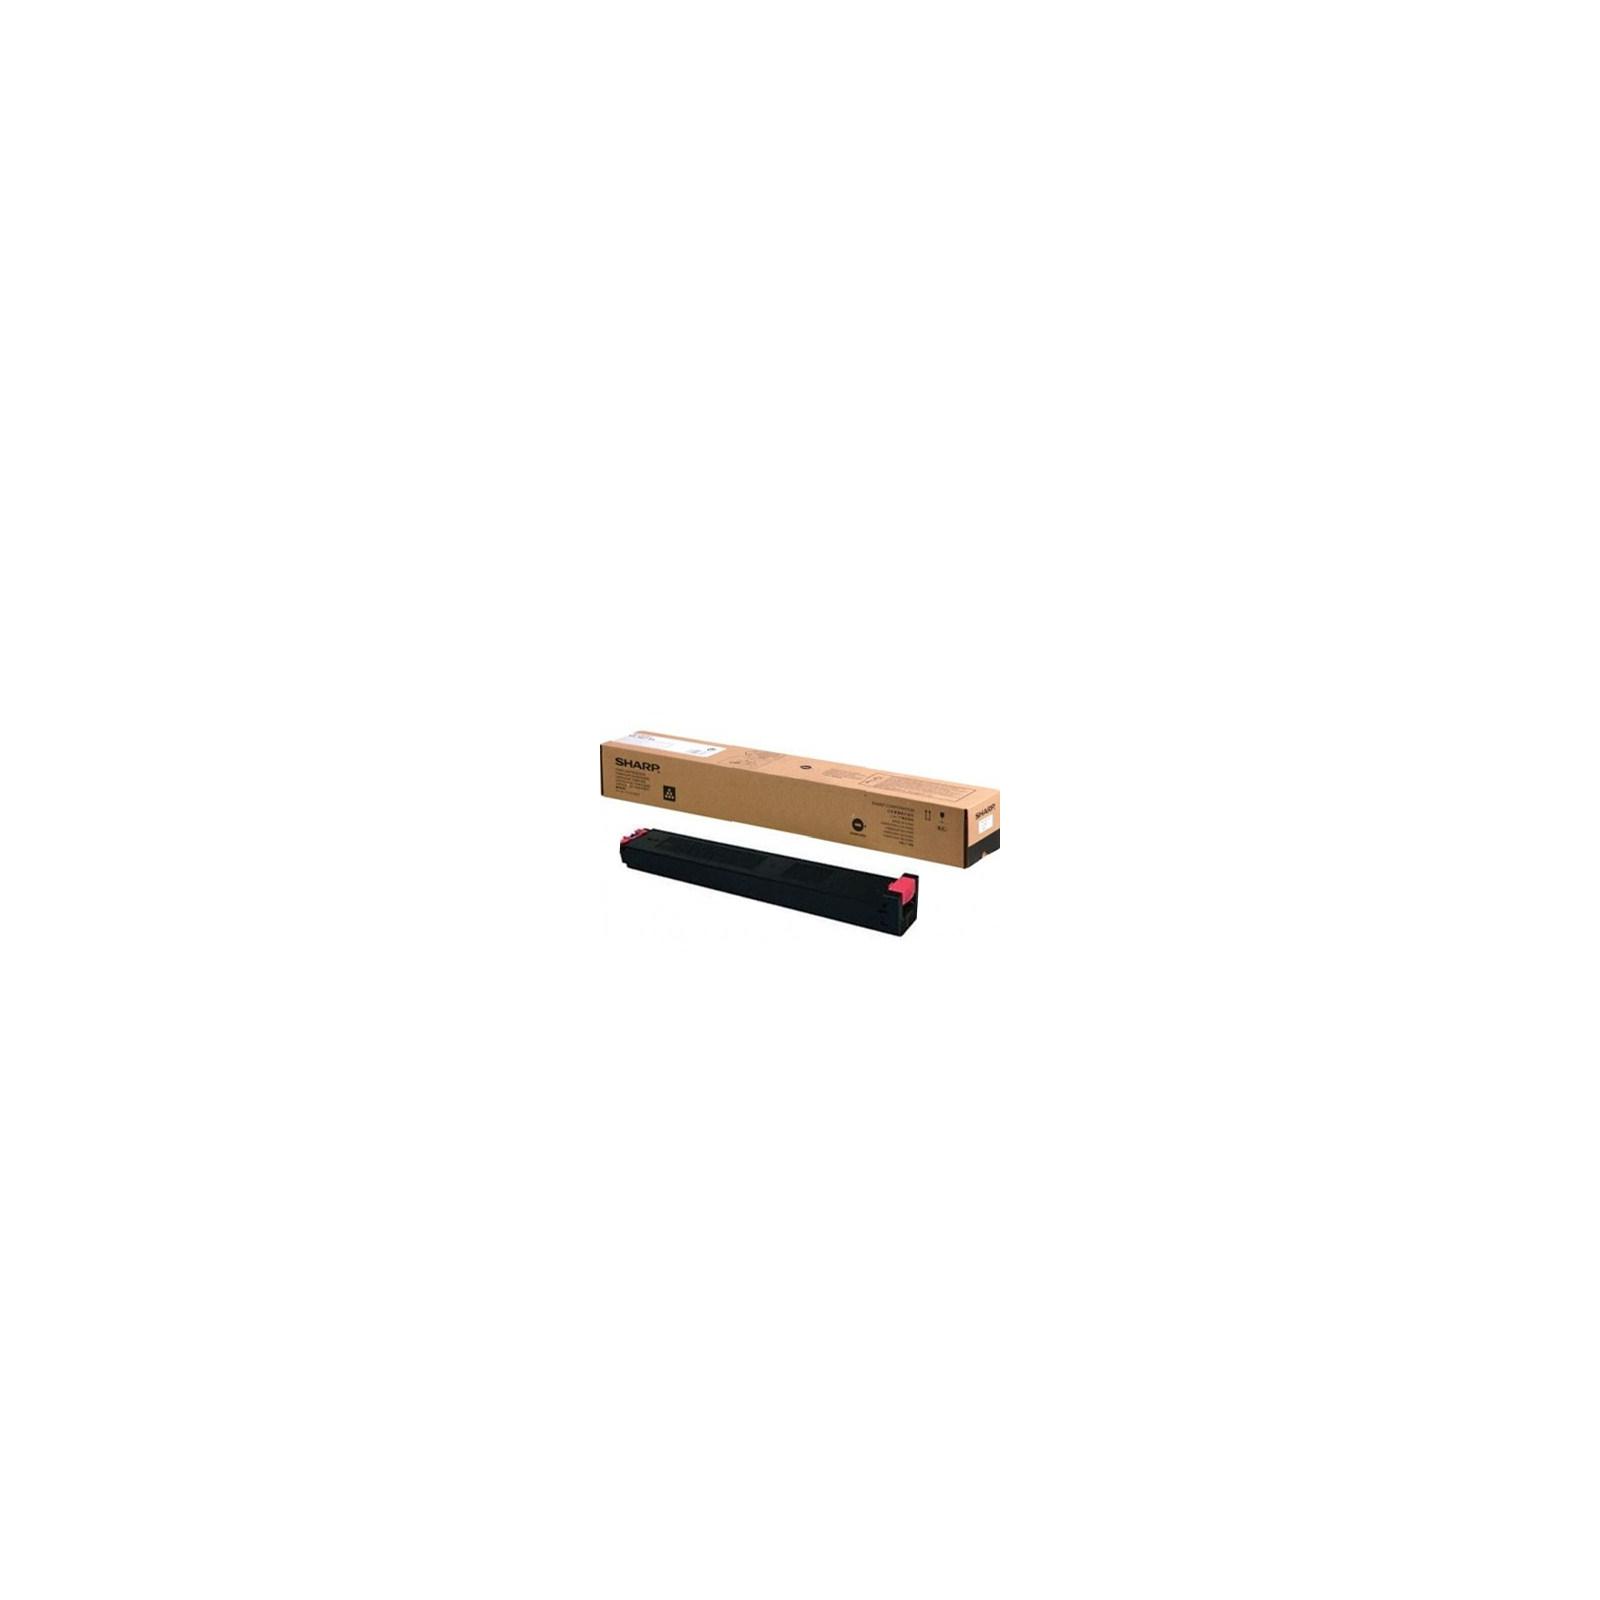 Тонер-картридж SHARP MX36GTMA (15K)Magent MX-2610N/3110N (MX-36GTMA)